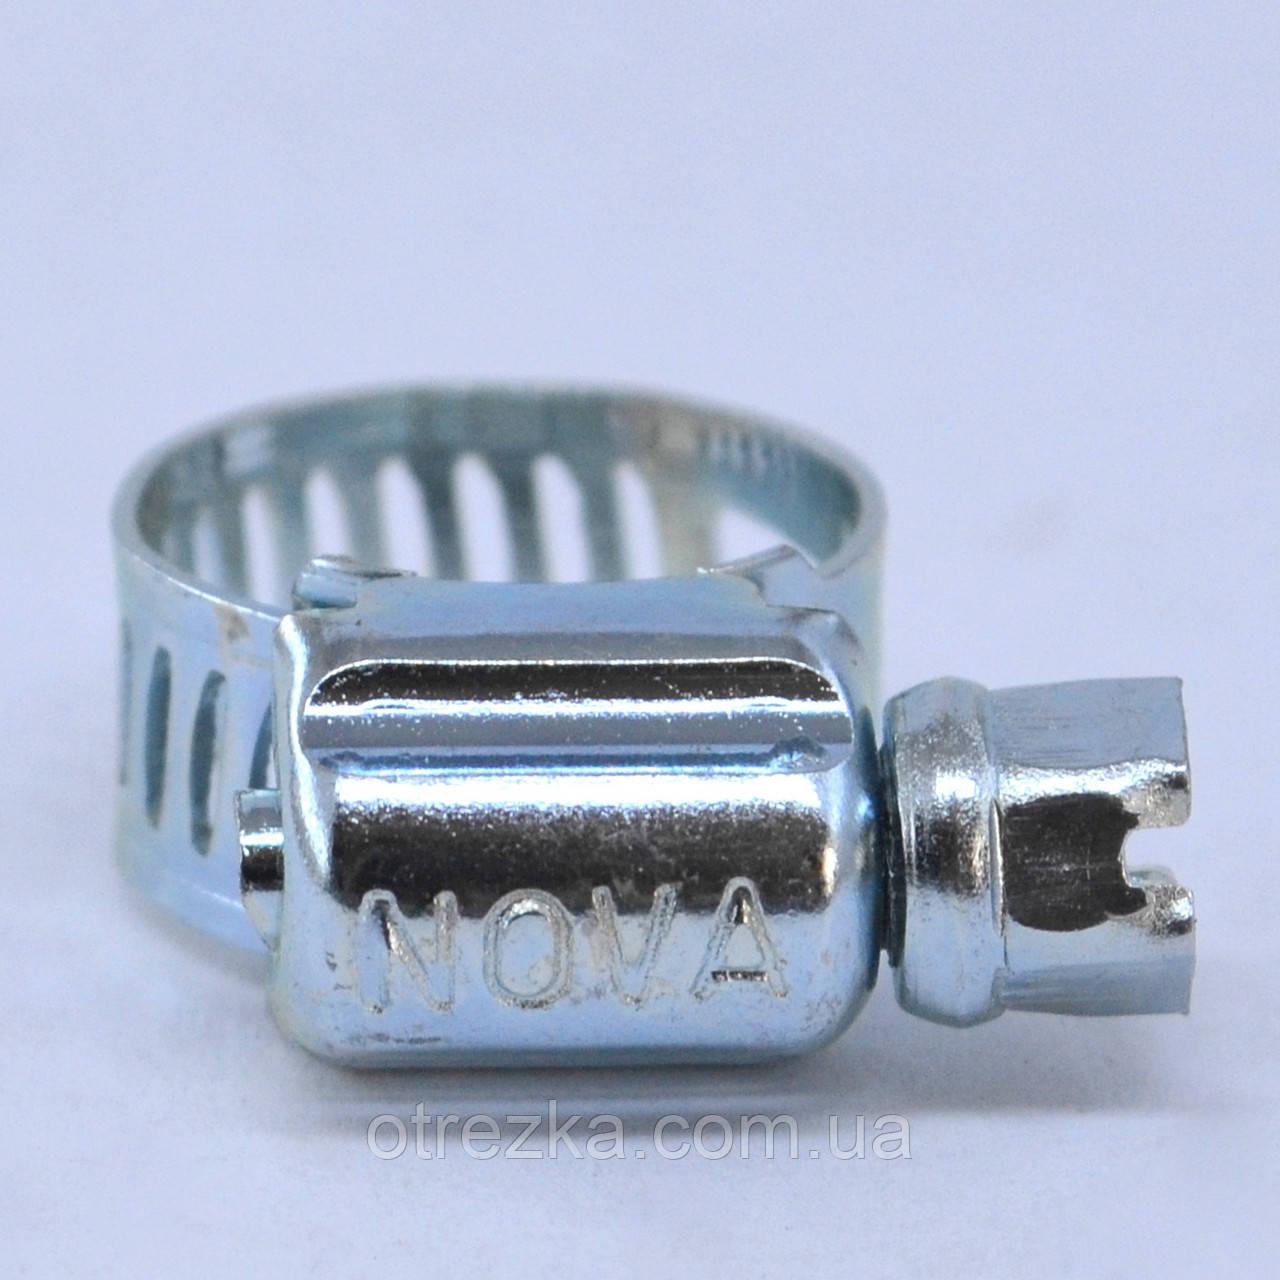 Хомут червячный  Nova (Хомут металевий черв'ячний) 32-51 мм